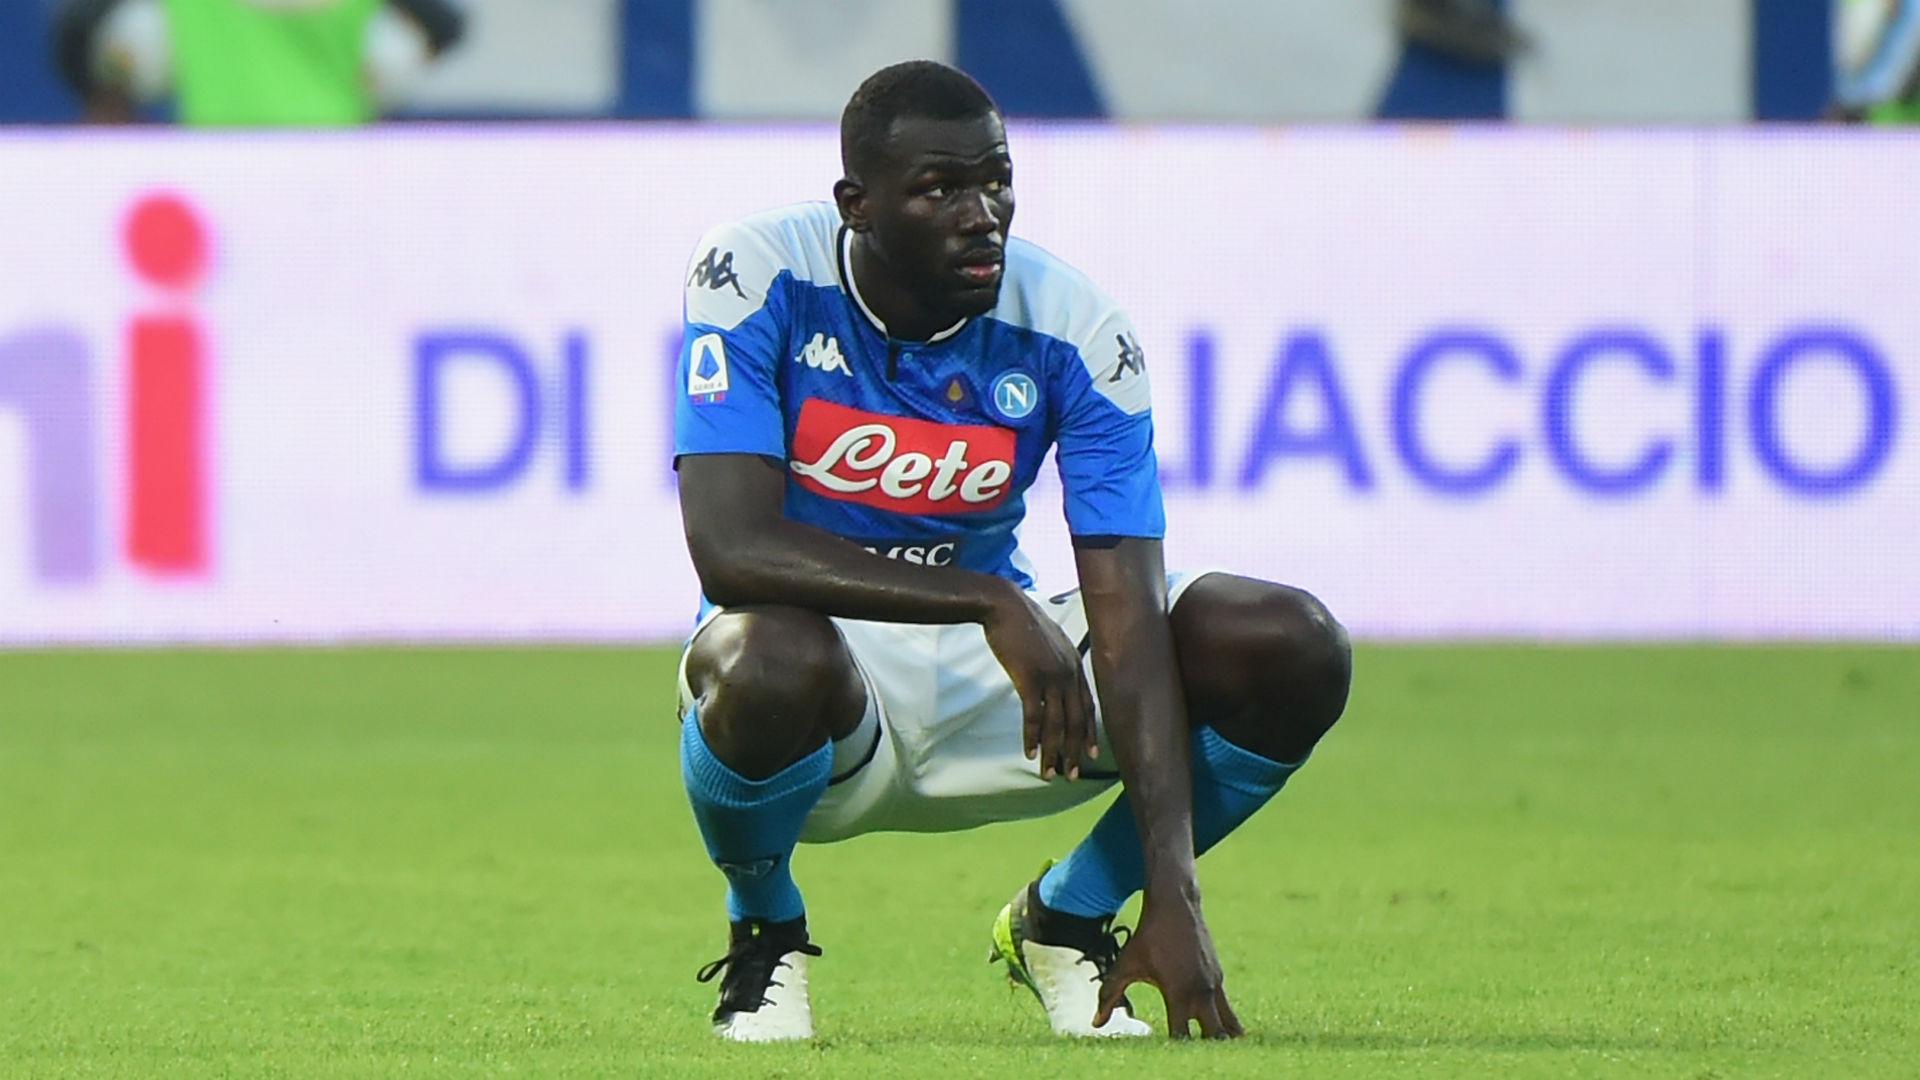 Koulibaly was 'extraordinary' even before I joined Napoli - Manolas